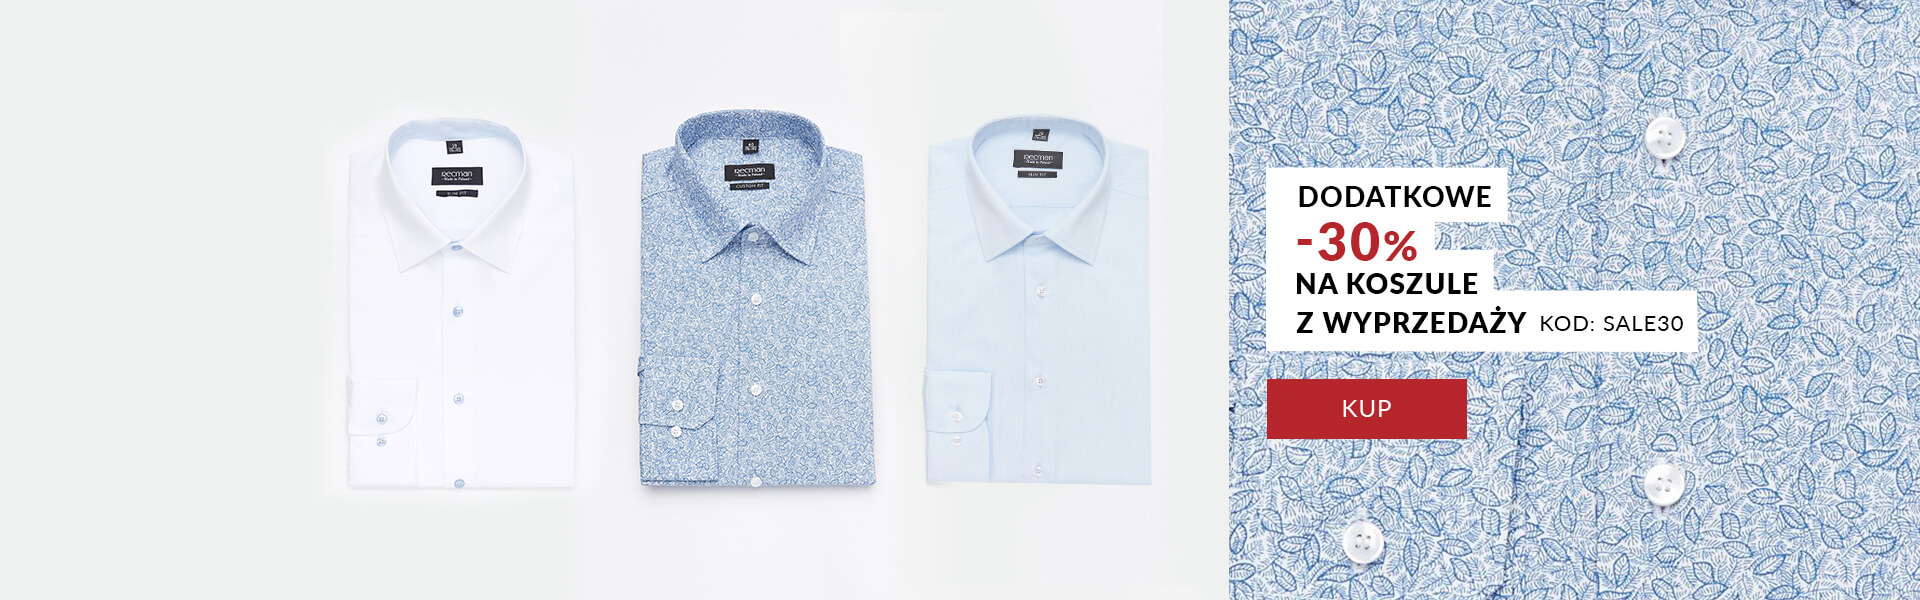 Koszula -30%